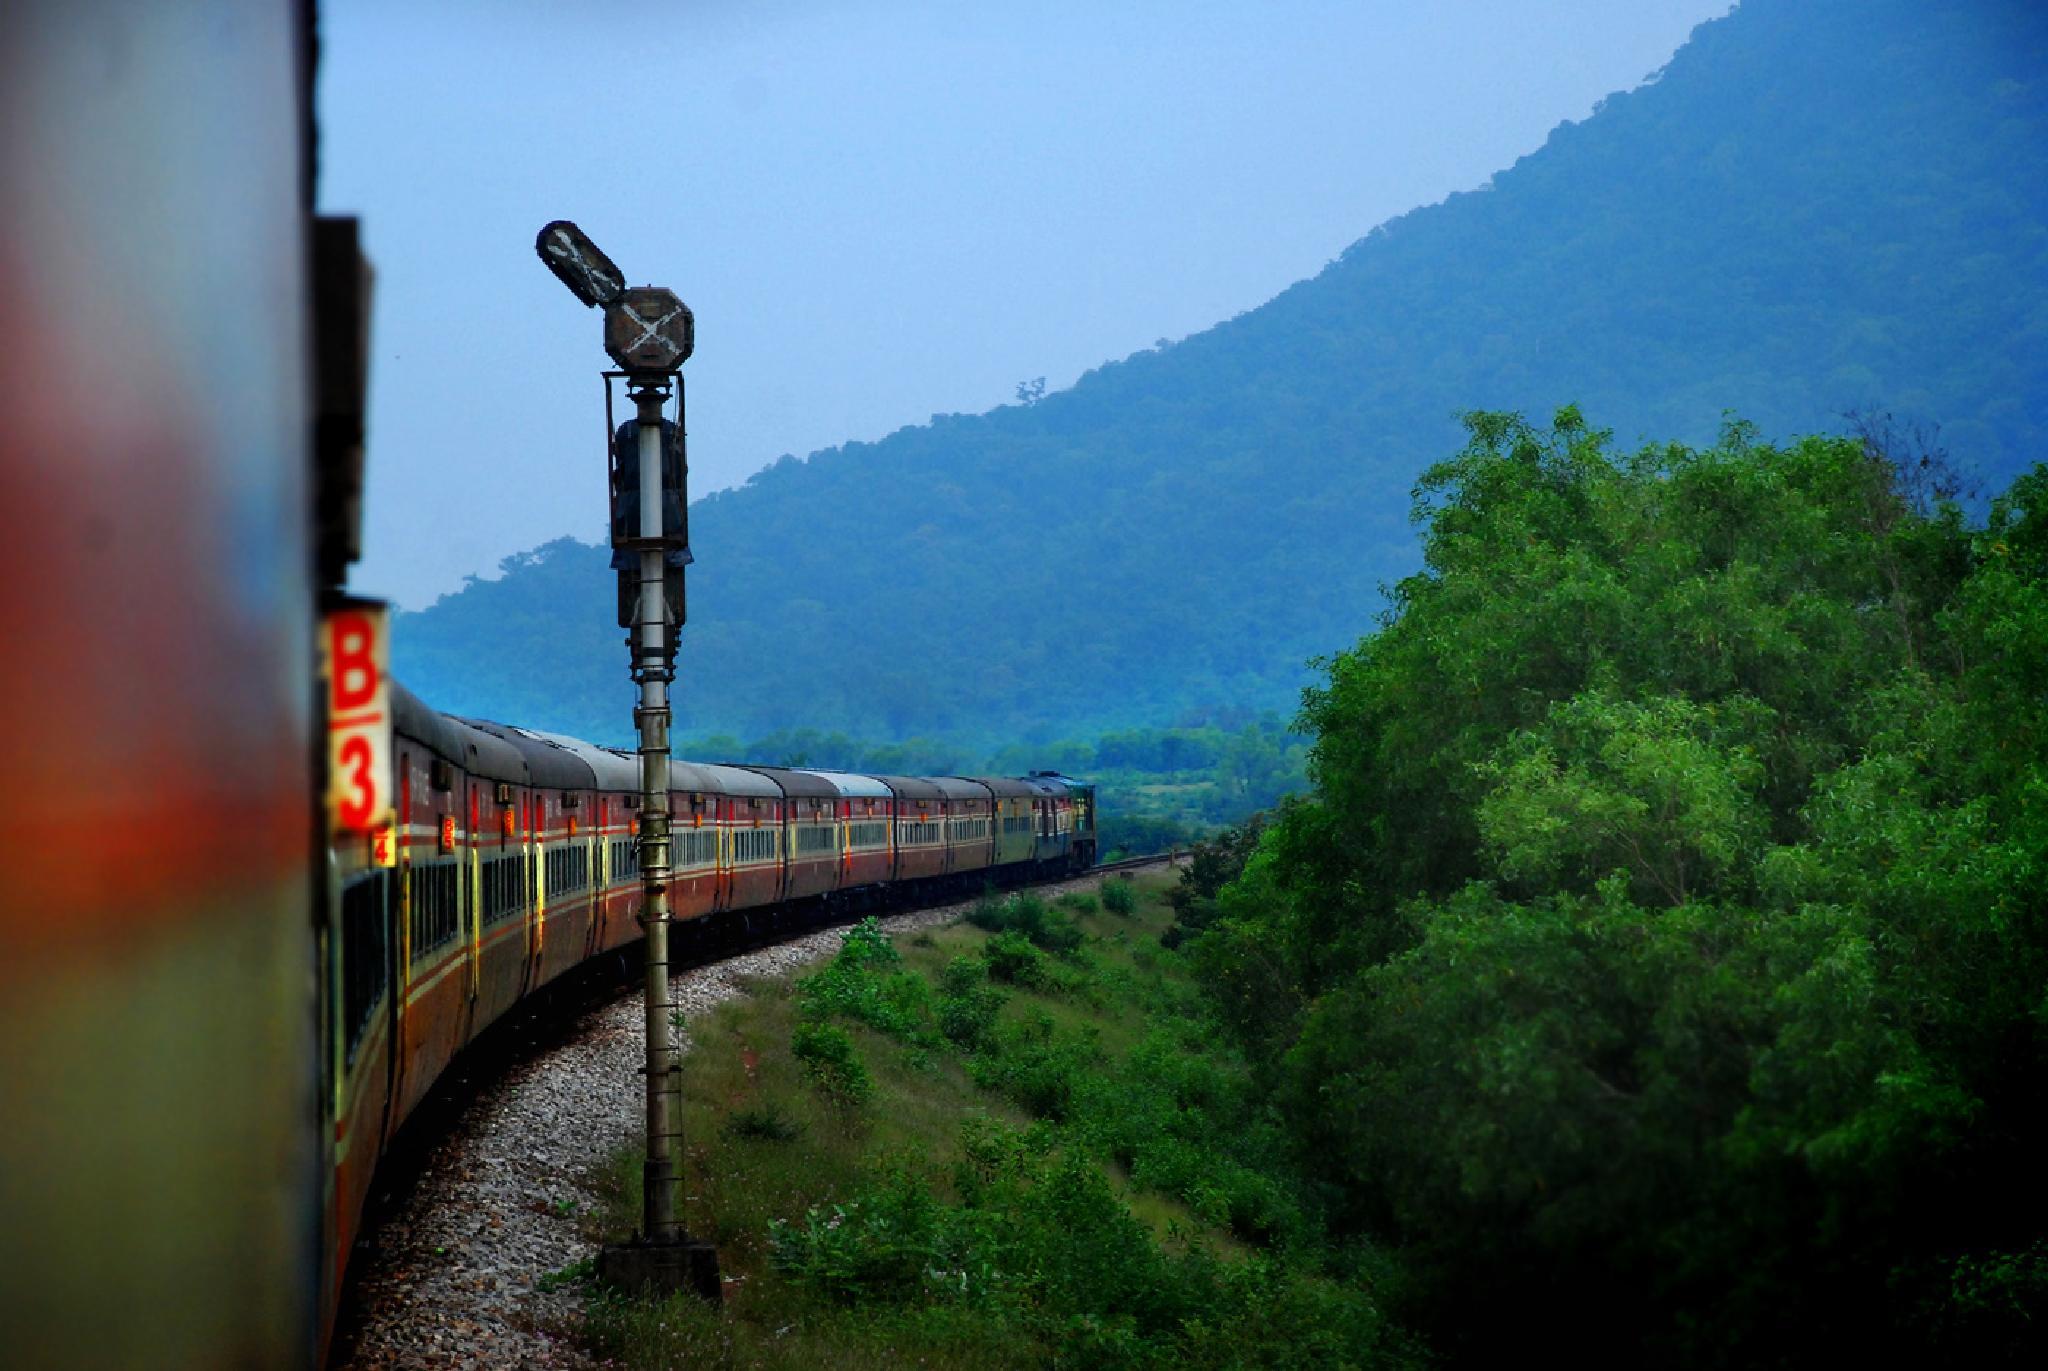 Rajdhani Express by Rauf